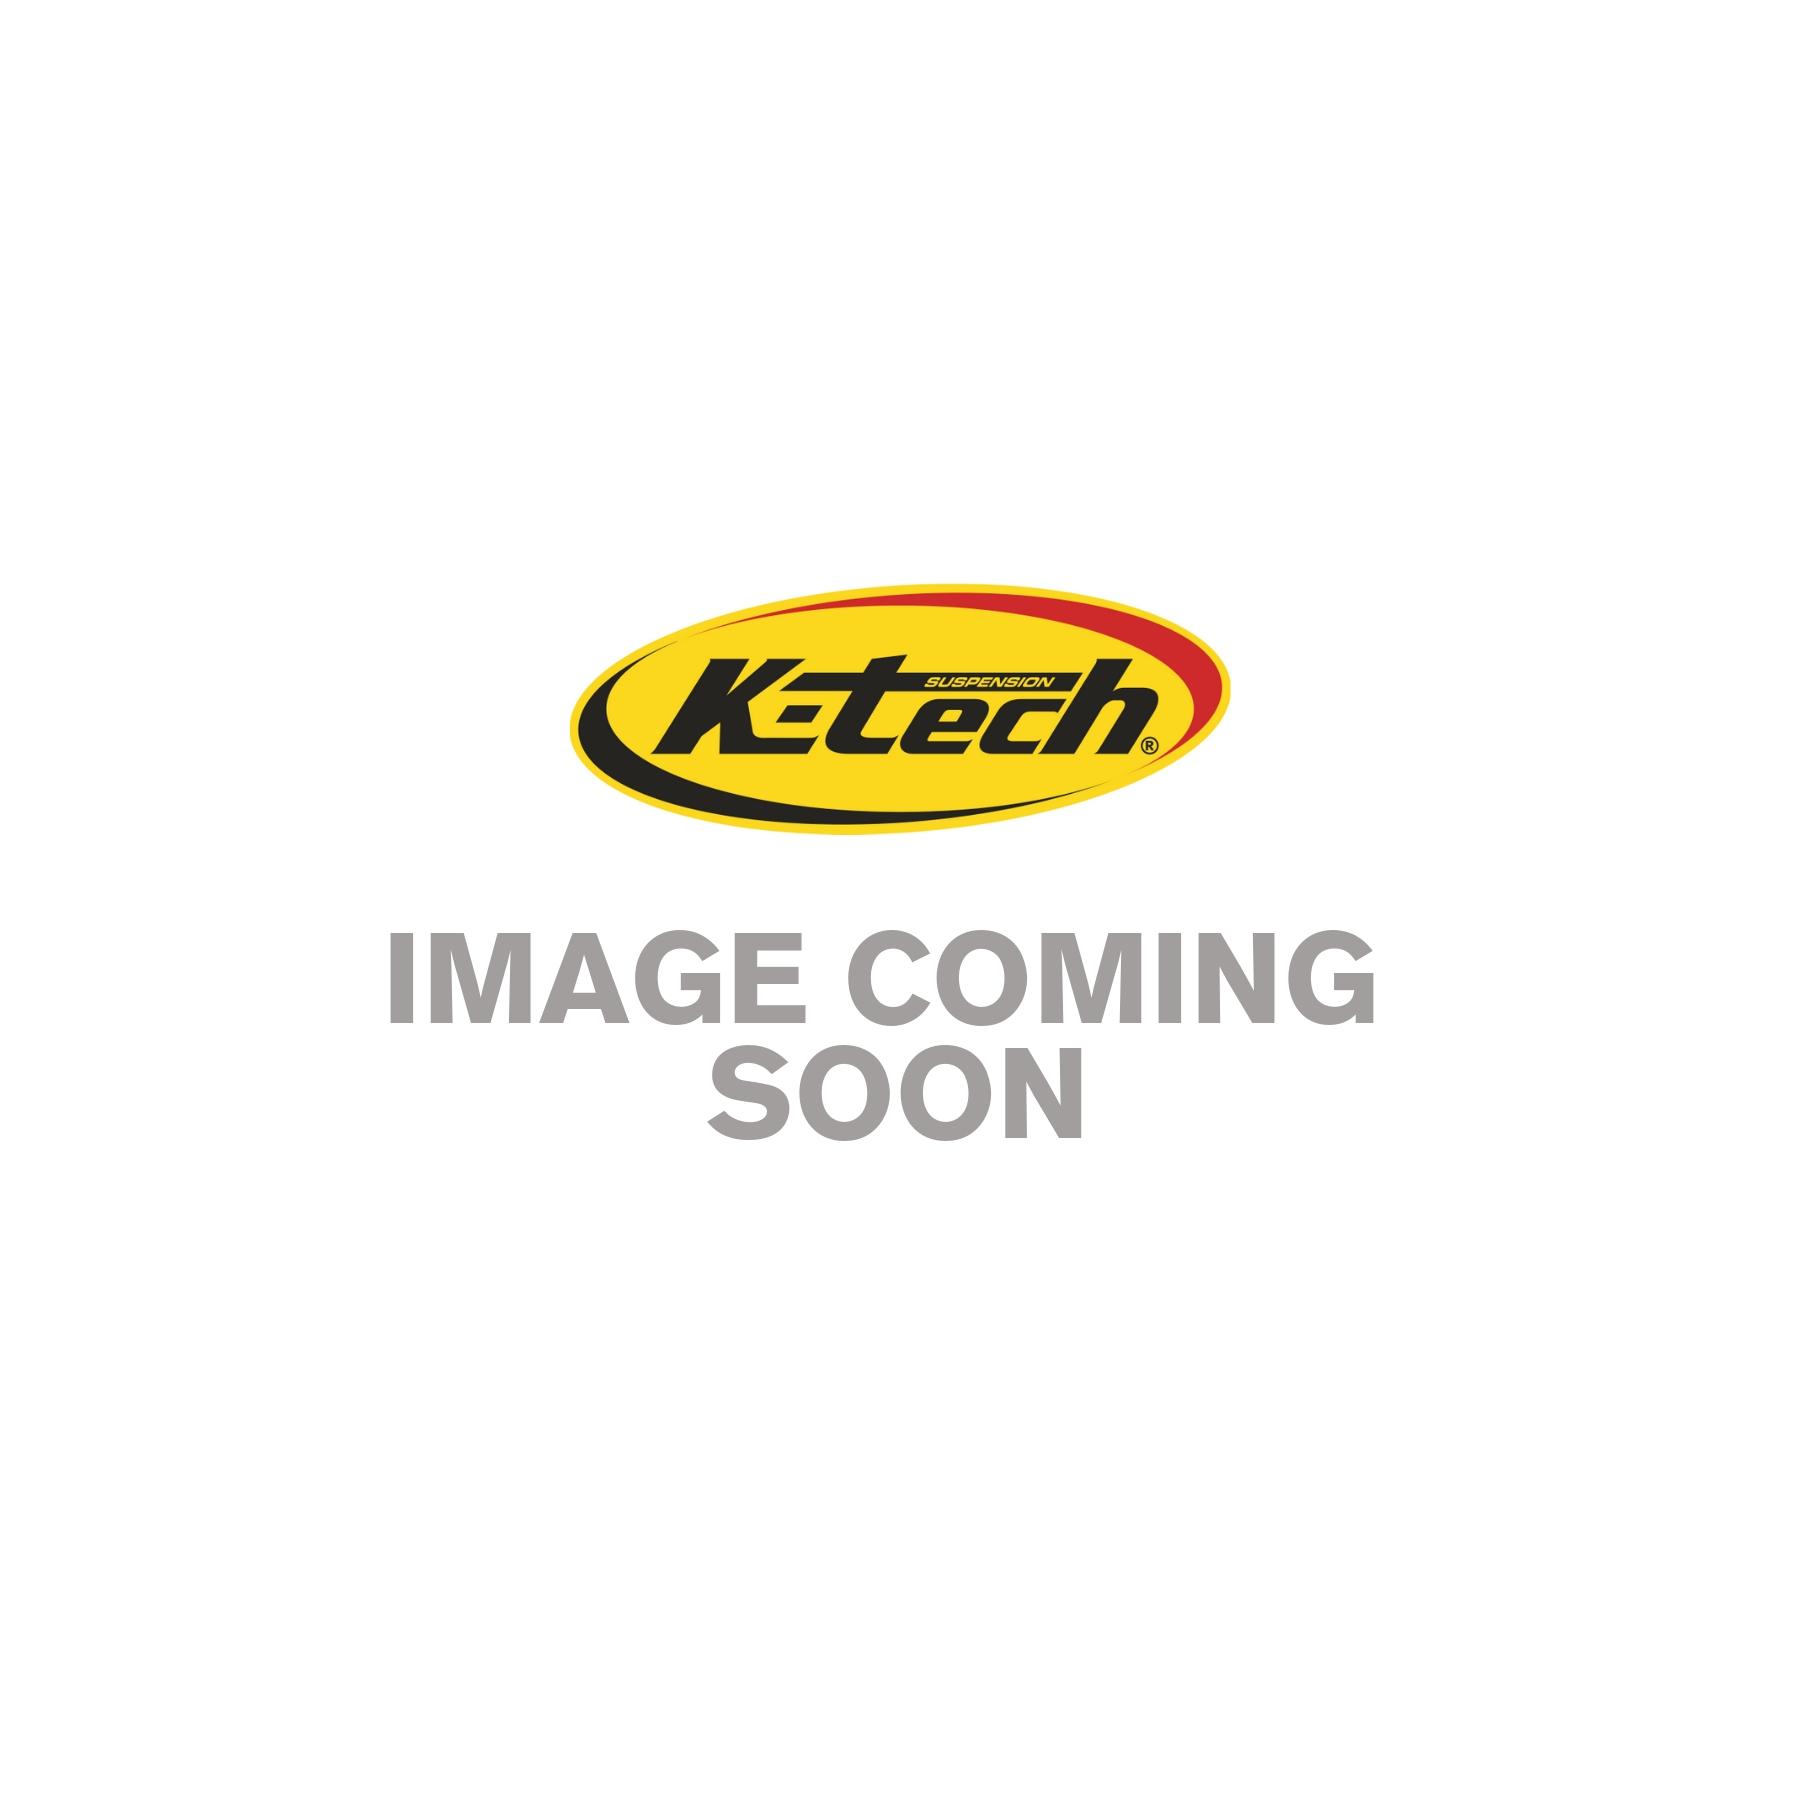 DDS Pro Shock Absorber Ducati Panigale 1199 2012-2014, 1299 2015-2018